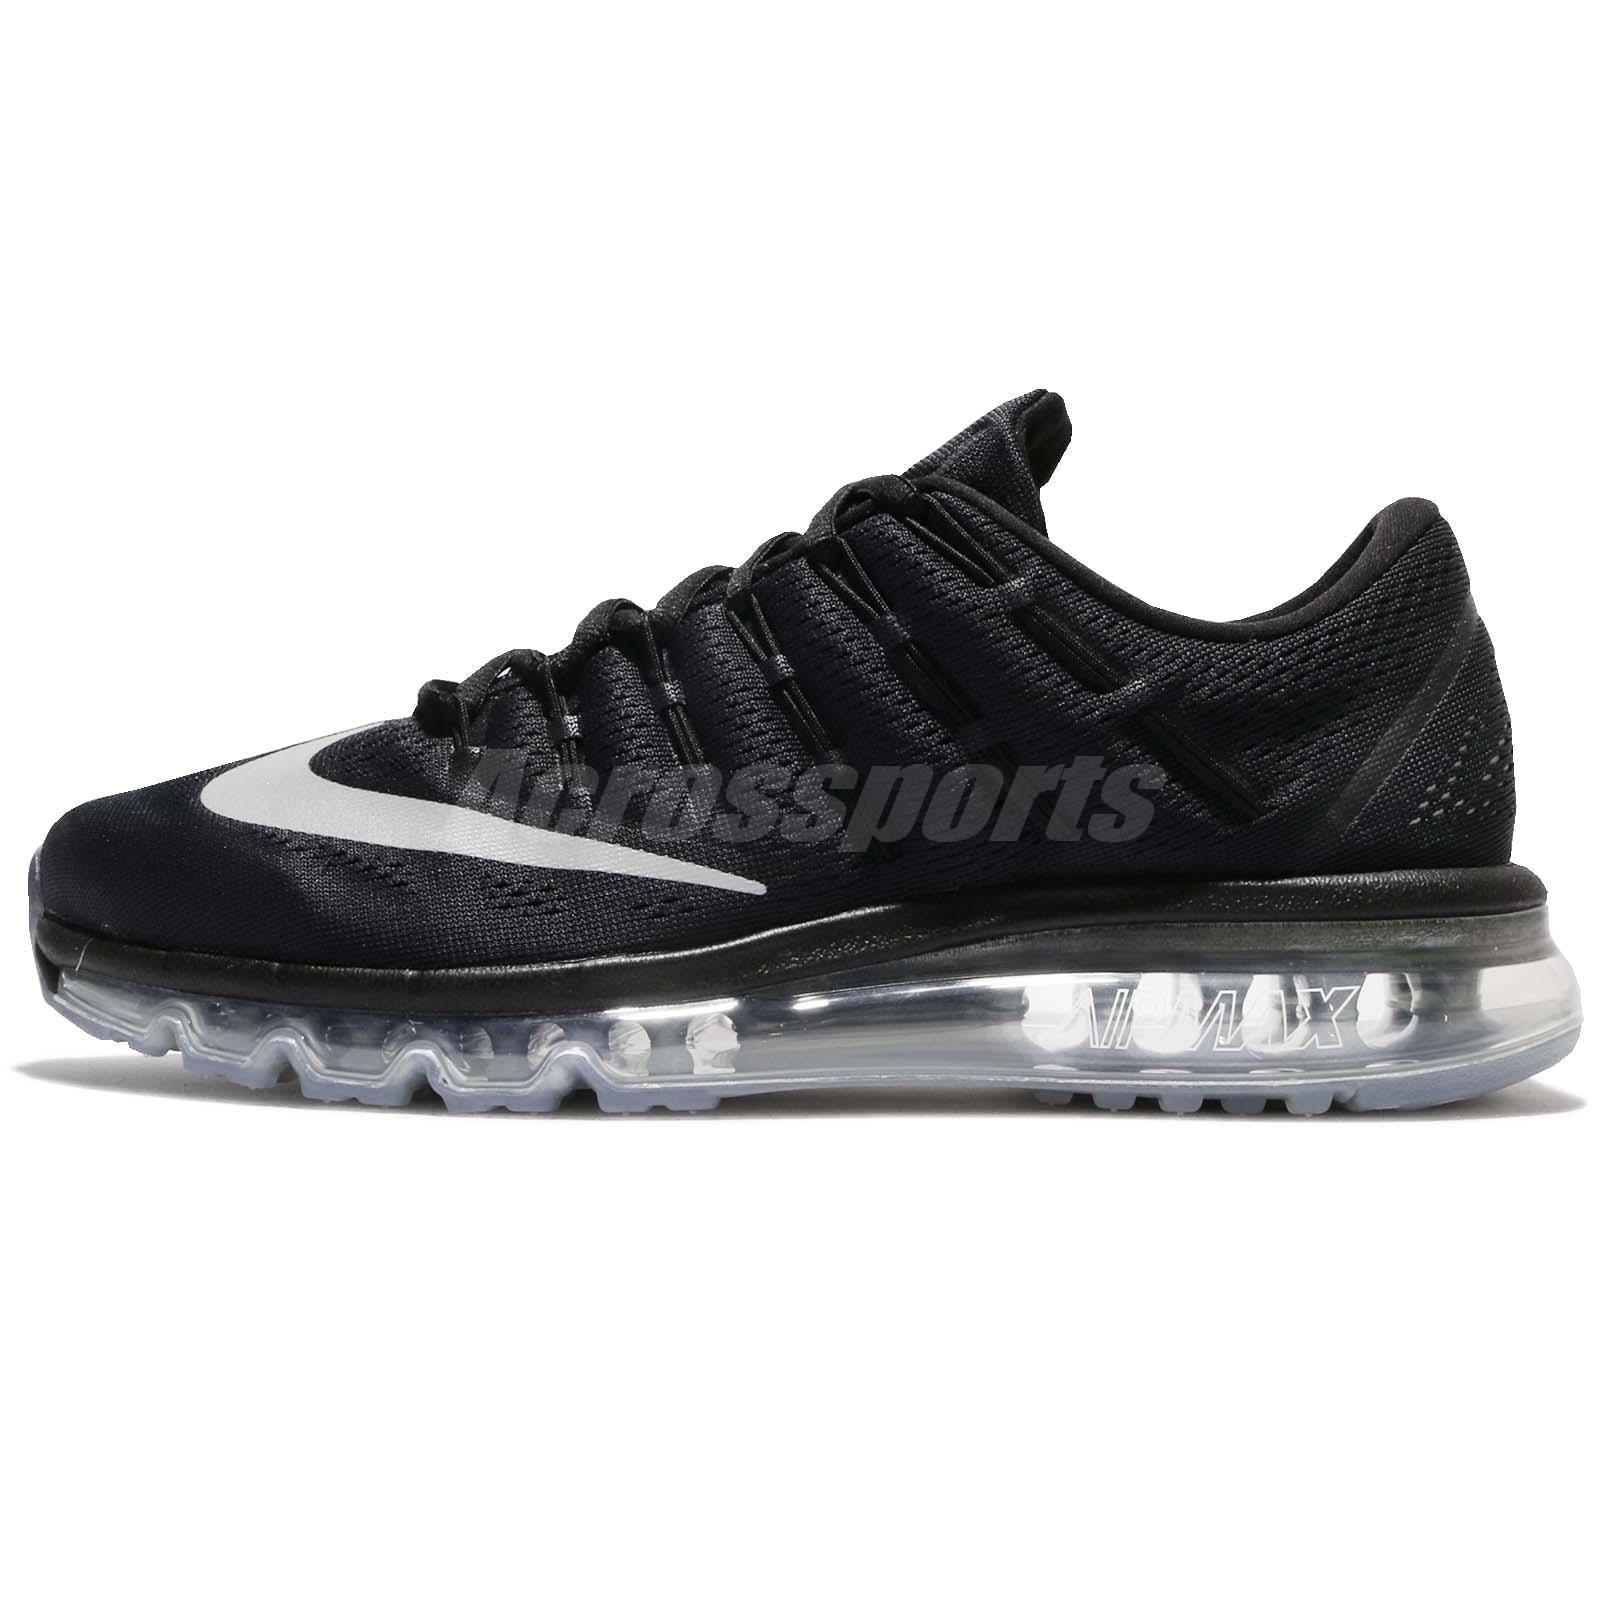 nike air max 2016 print swoosh mens running shoes. Black Bedroom Furniture Sets. Home Design Ideas